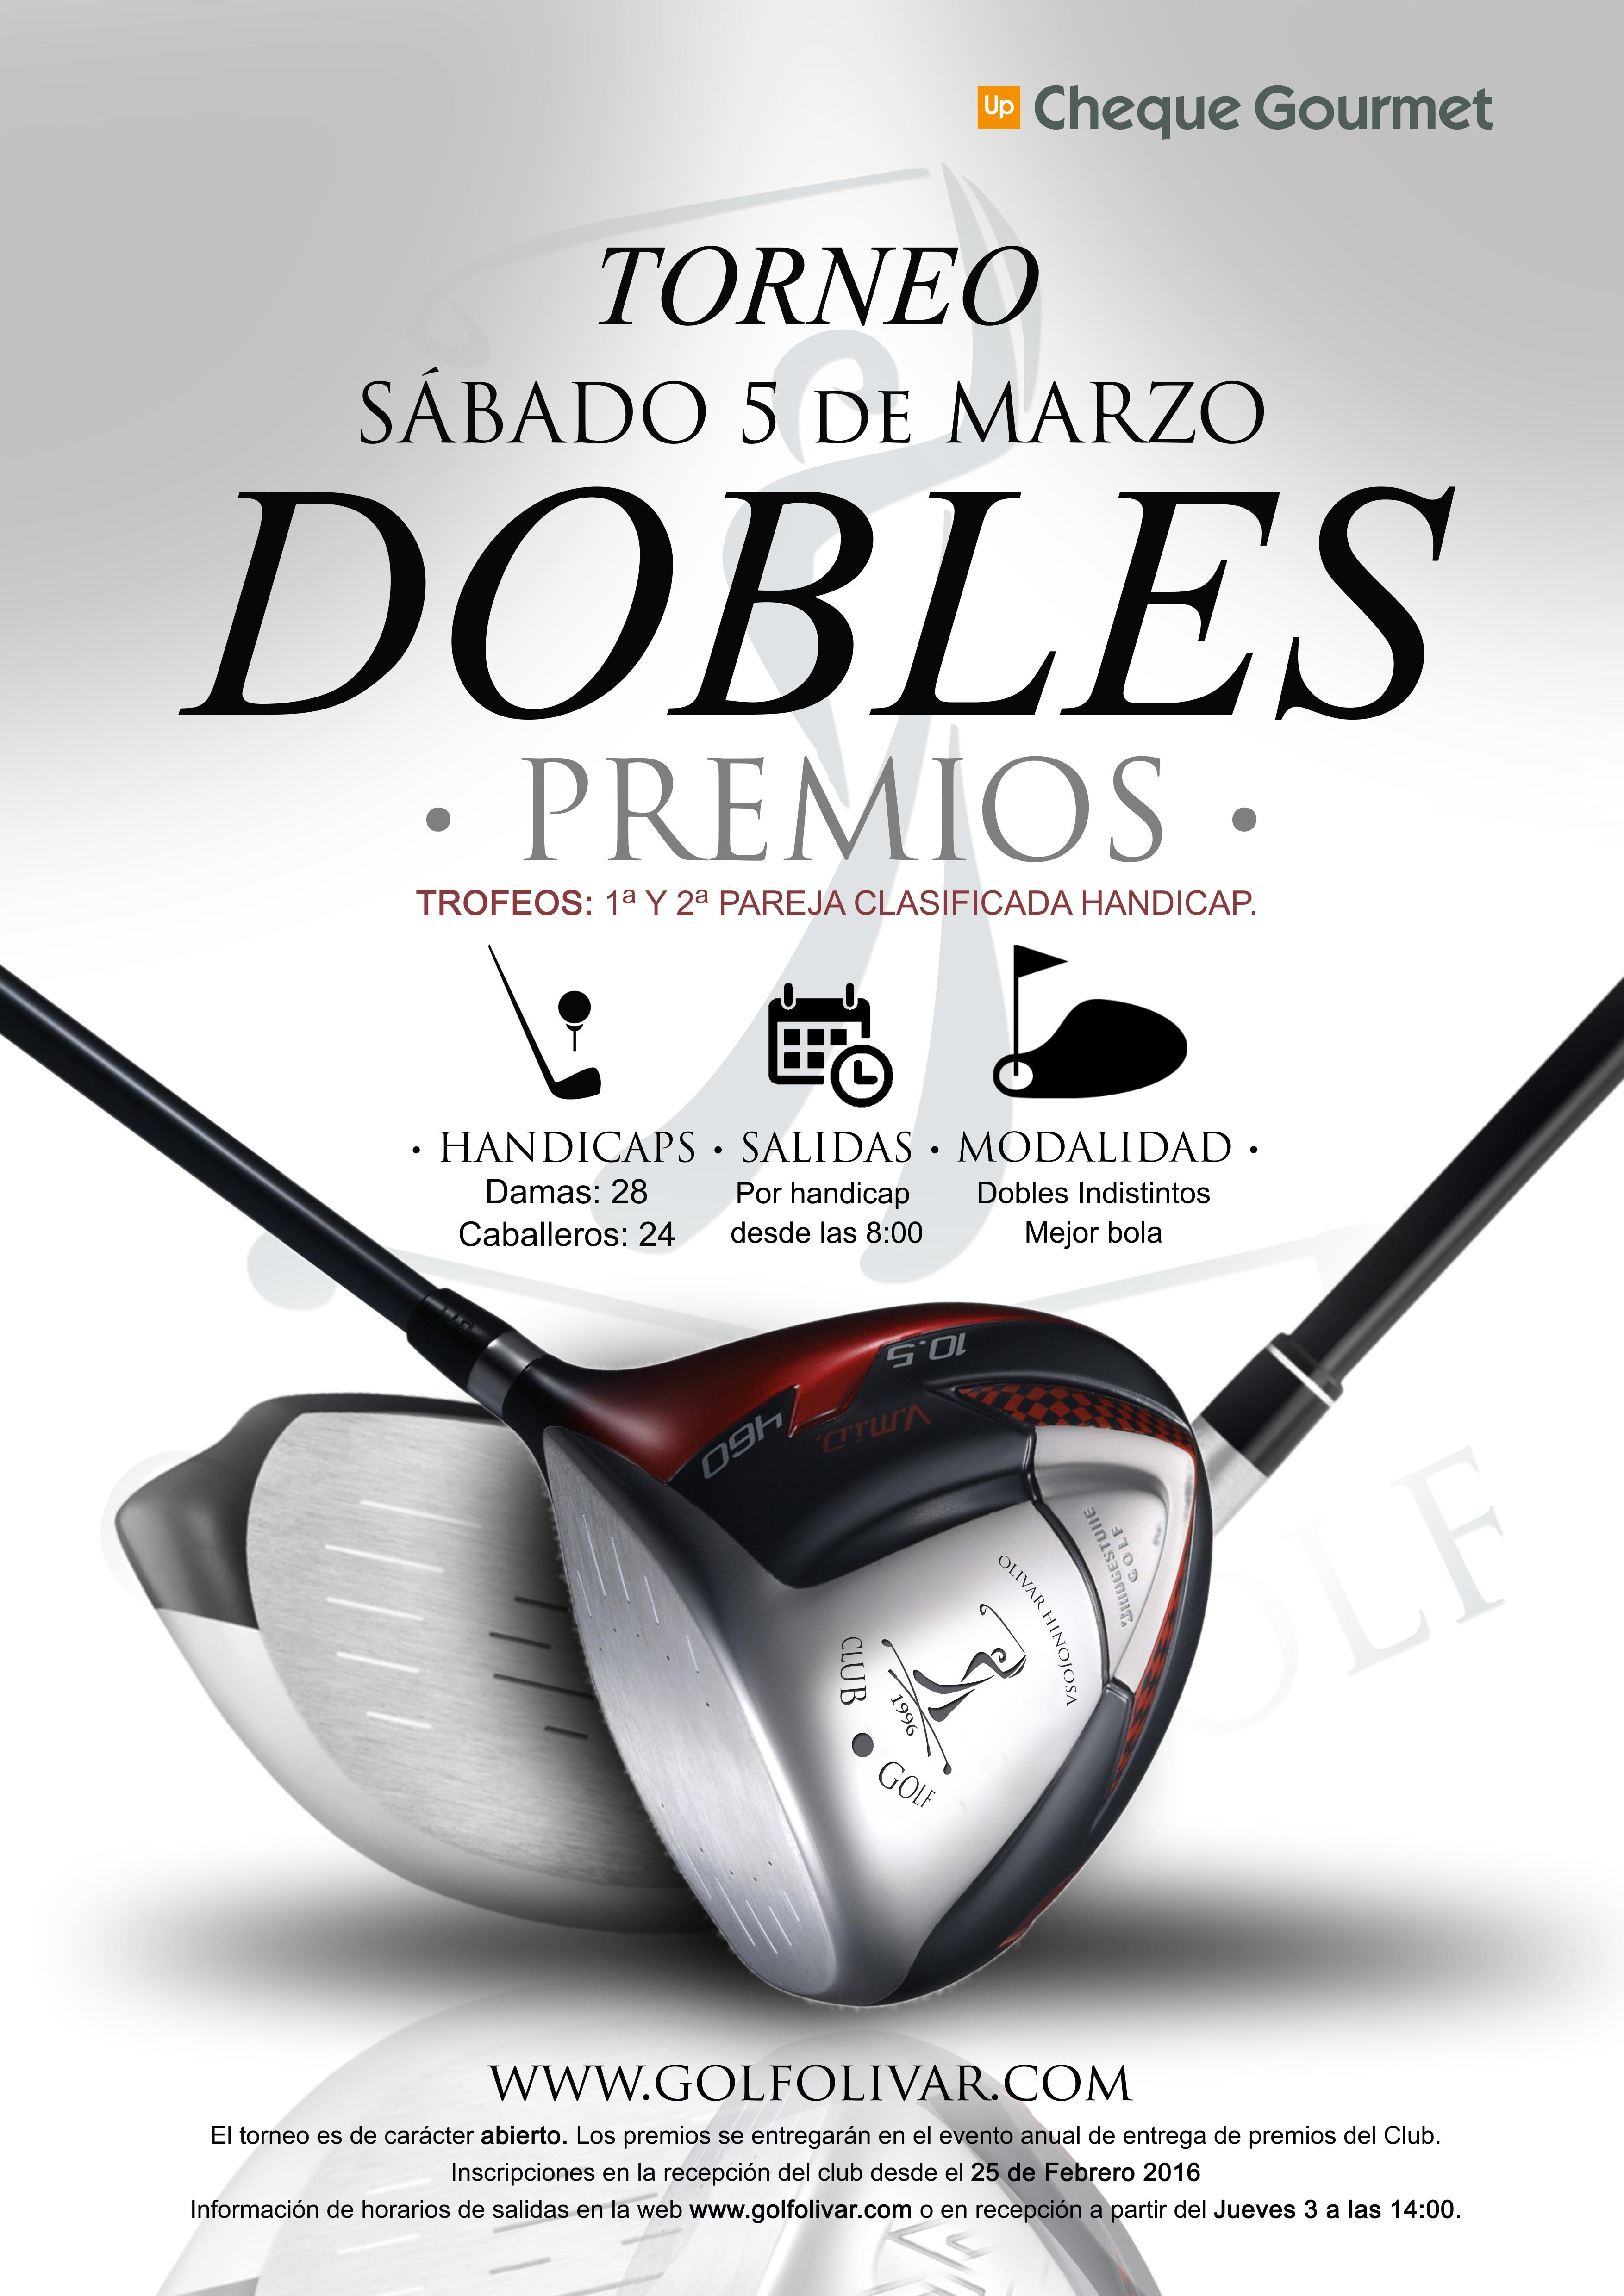 https://www.perfectpixel.es/wp-content/uploads/2016/02/Torneo-de-Dobles-Olivar-Hinojosa-Cartel-by-PerfectPixel-Publicidad.jpg